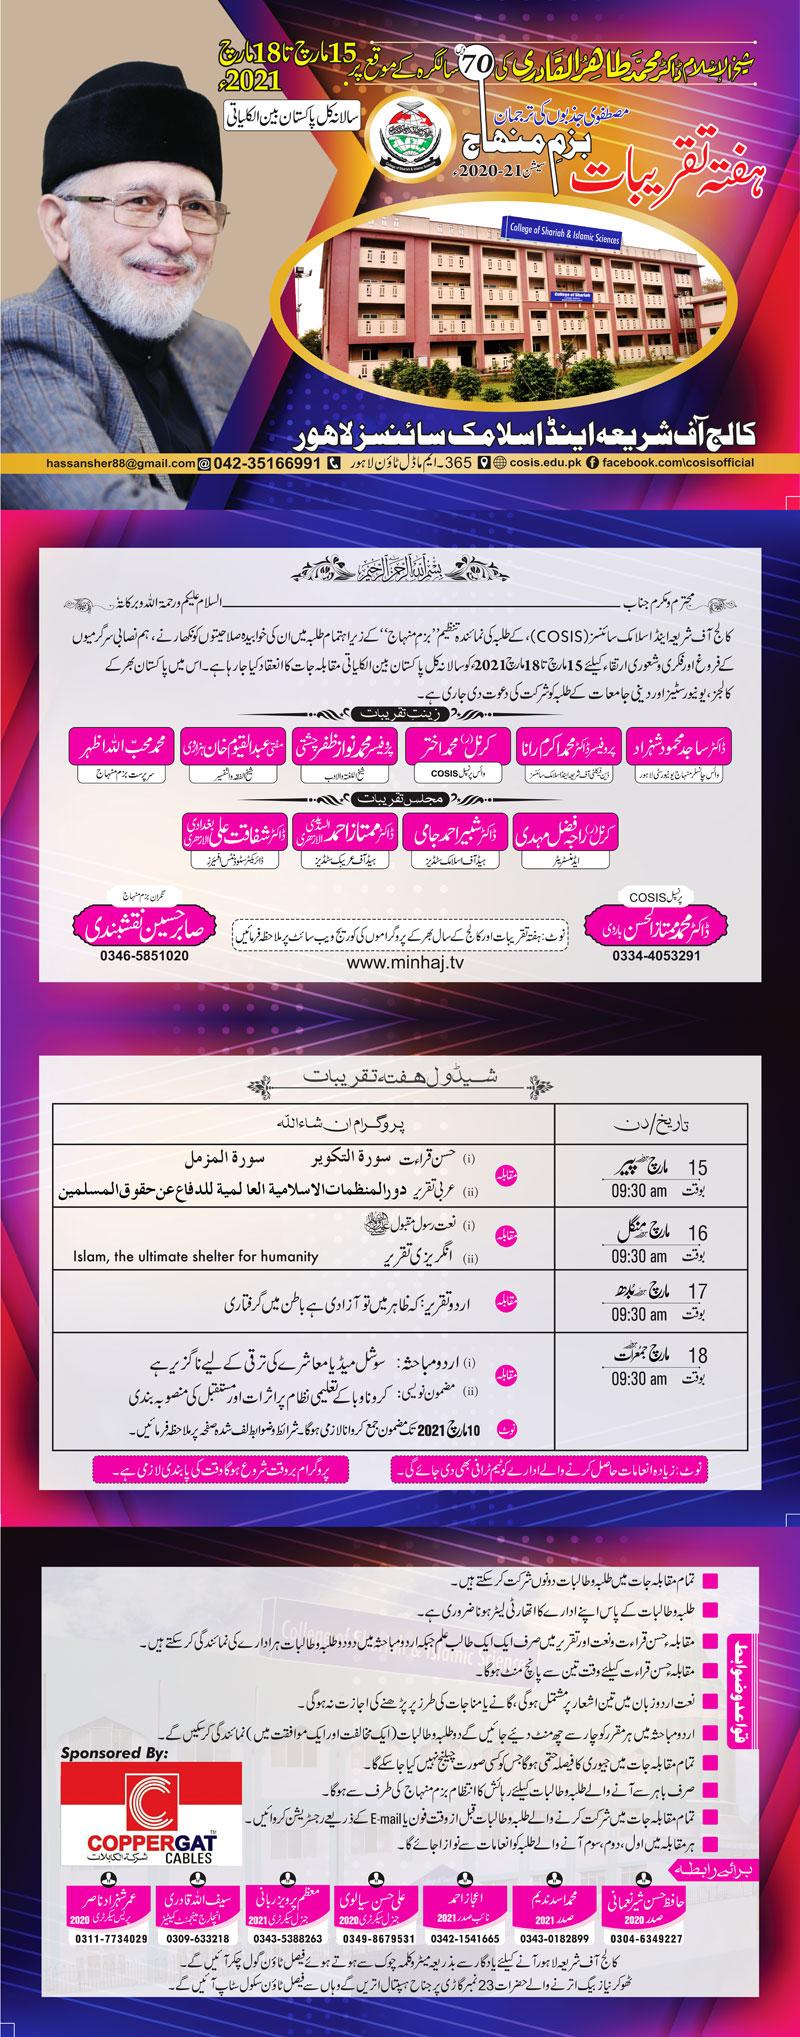 Quaid Day 2021 - COSIS week-long celebrations